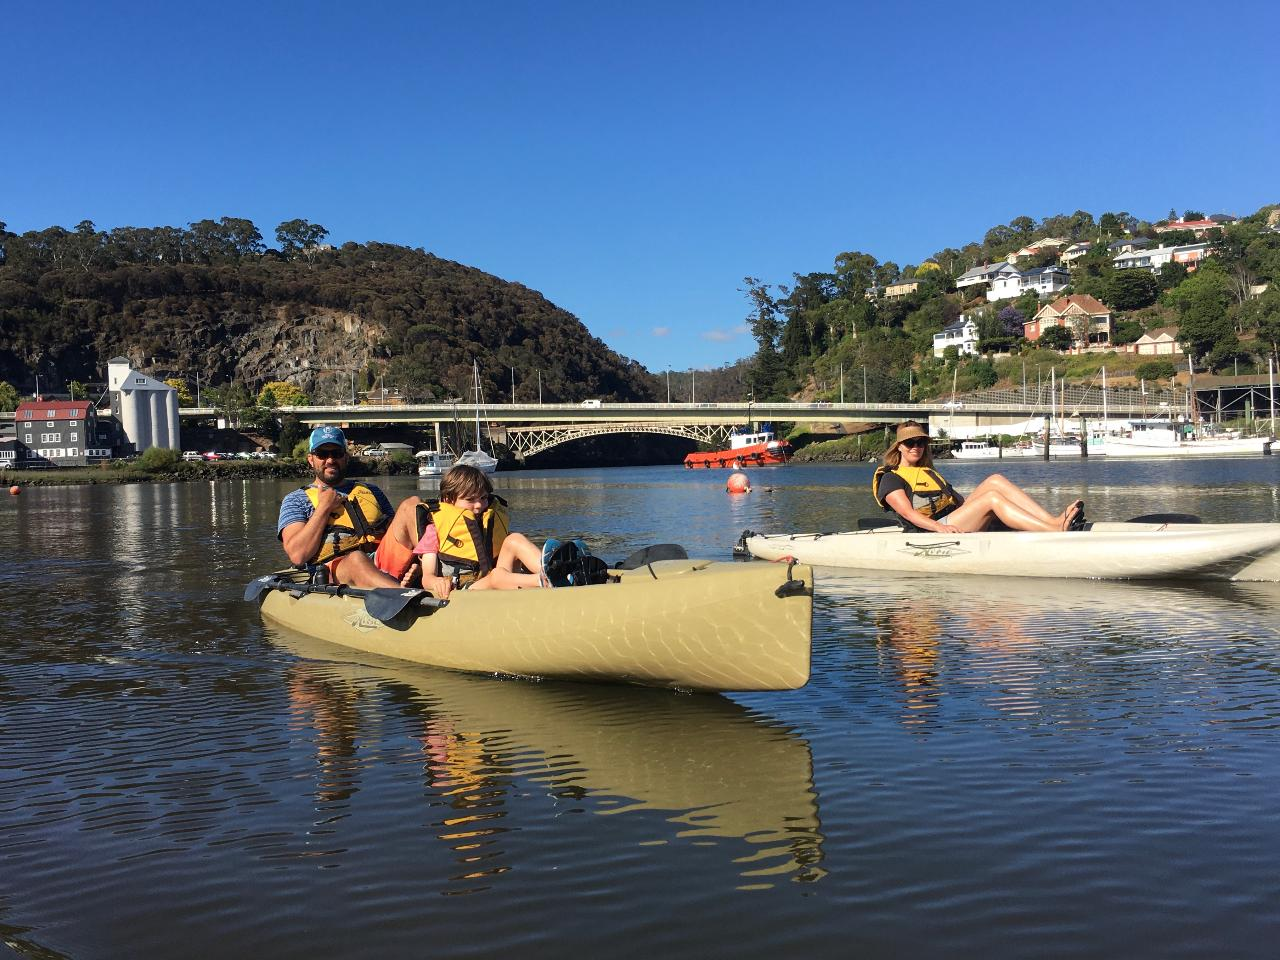 Hobie kayak fishing tour on the Tamar River